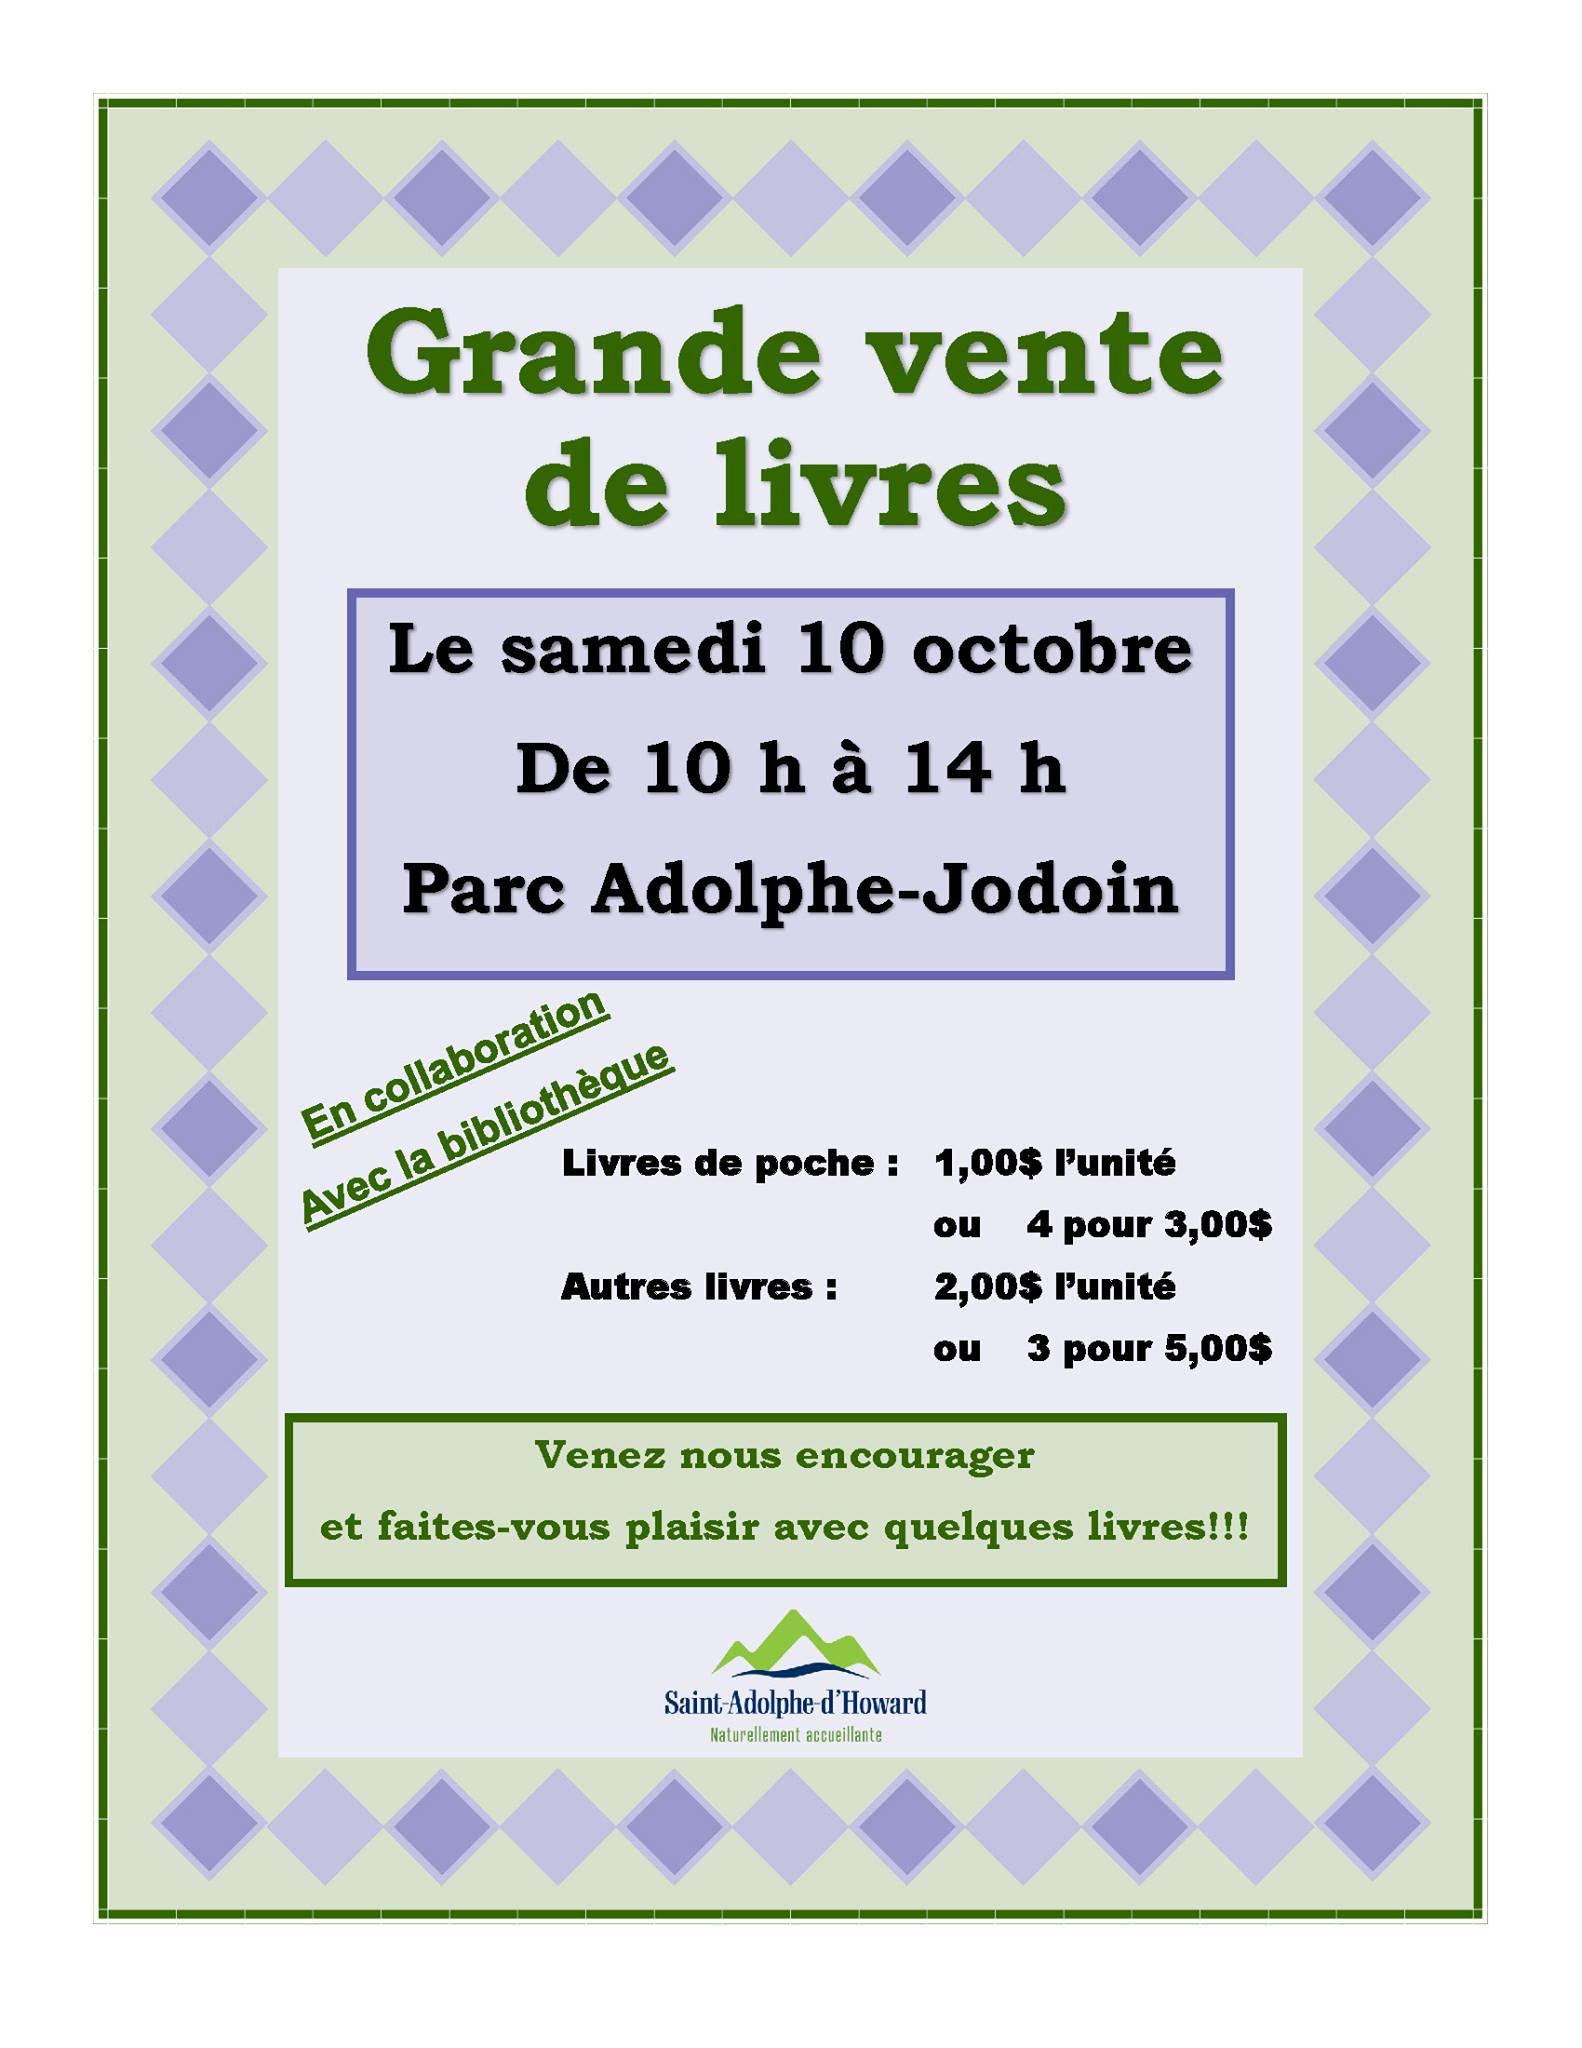 Grande vente de livres - Parc Adolphe-Jodoin